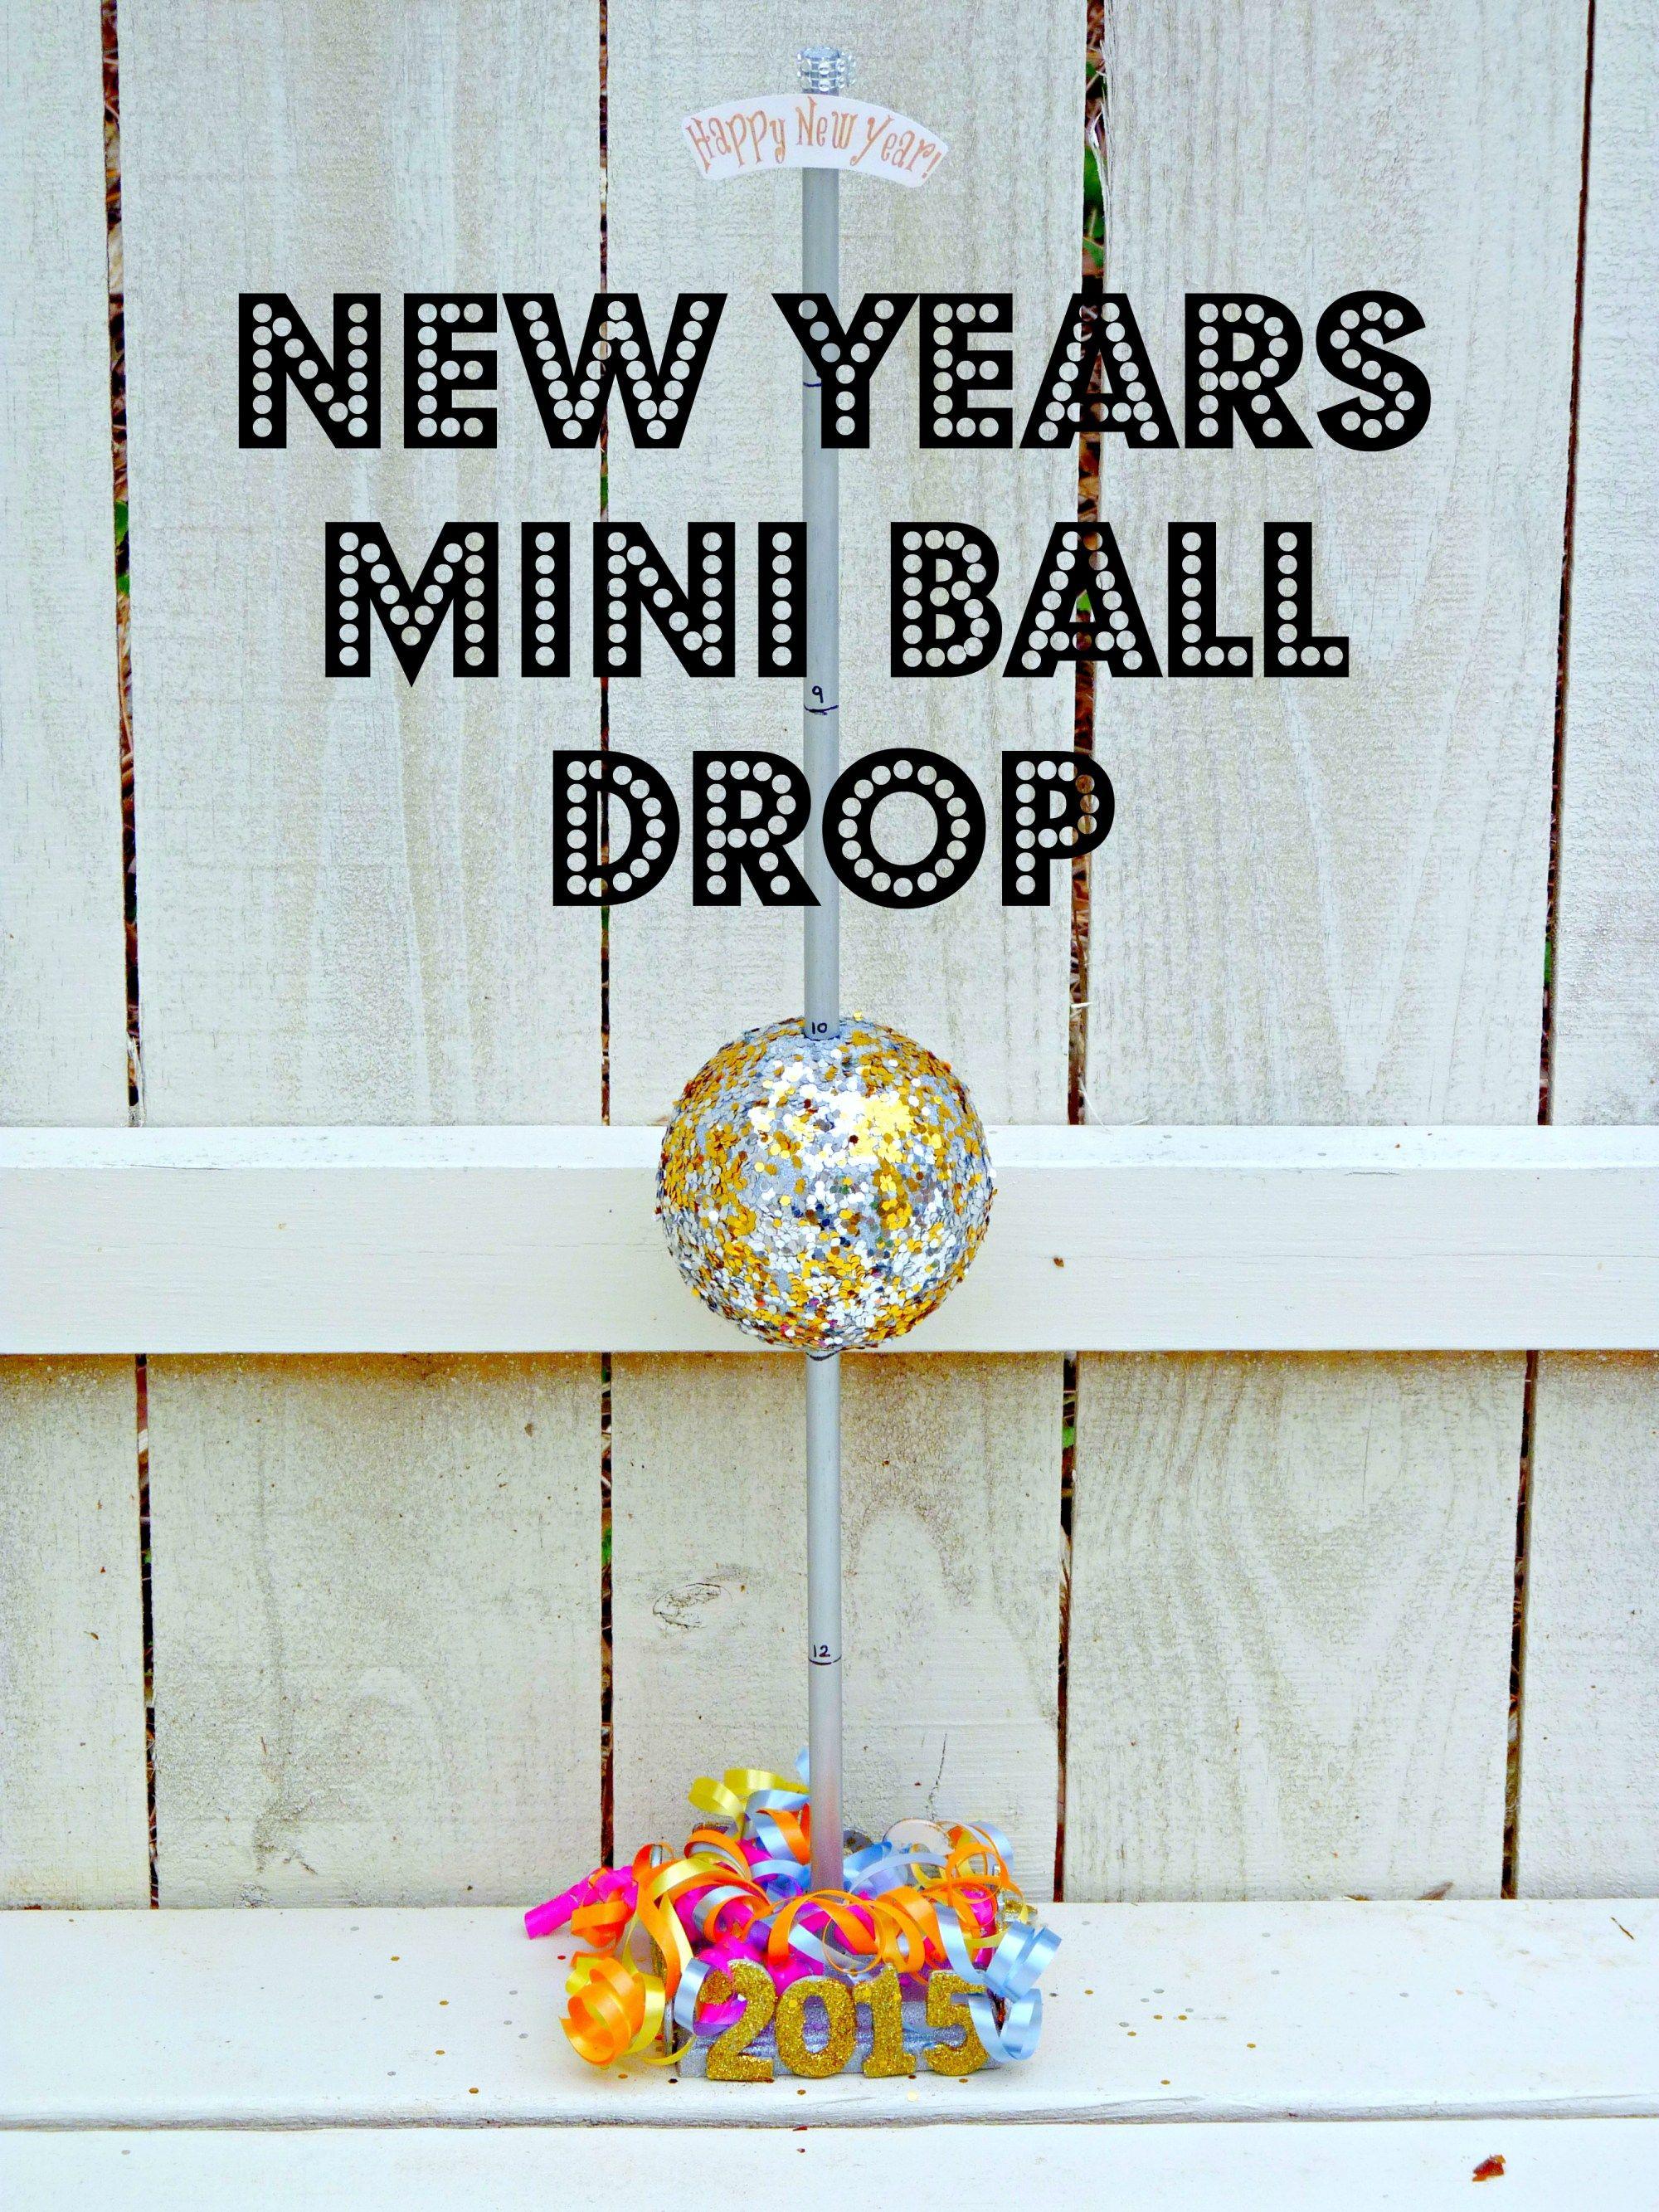 New Years Eve Mini Ball Drop New years eve ball, New